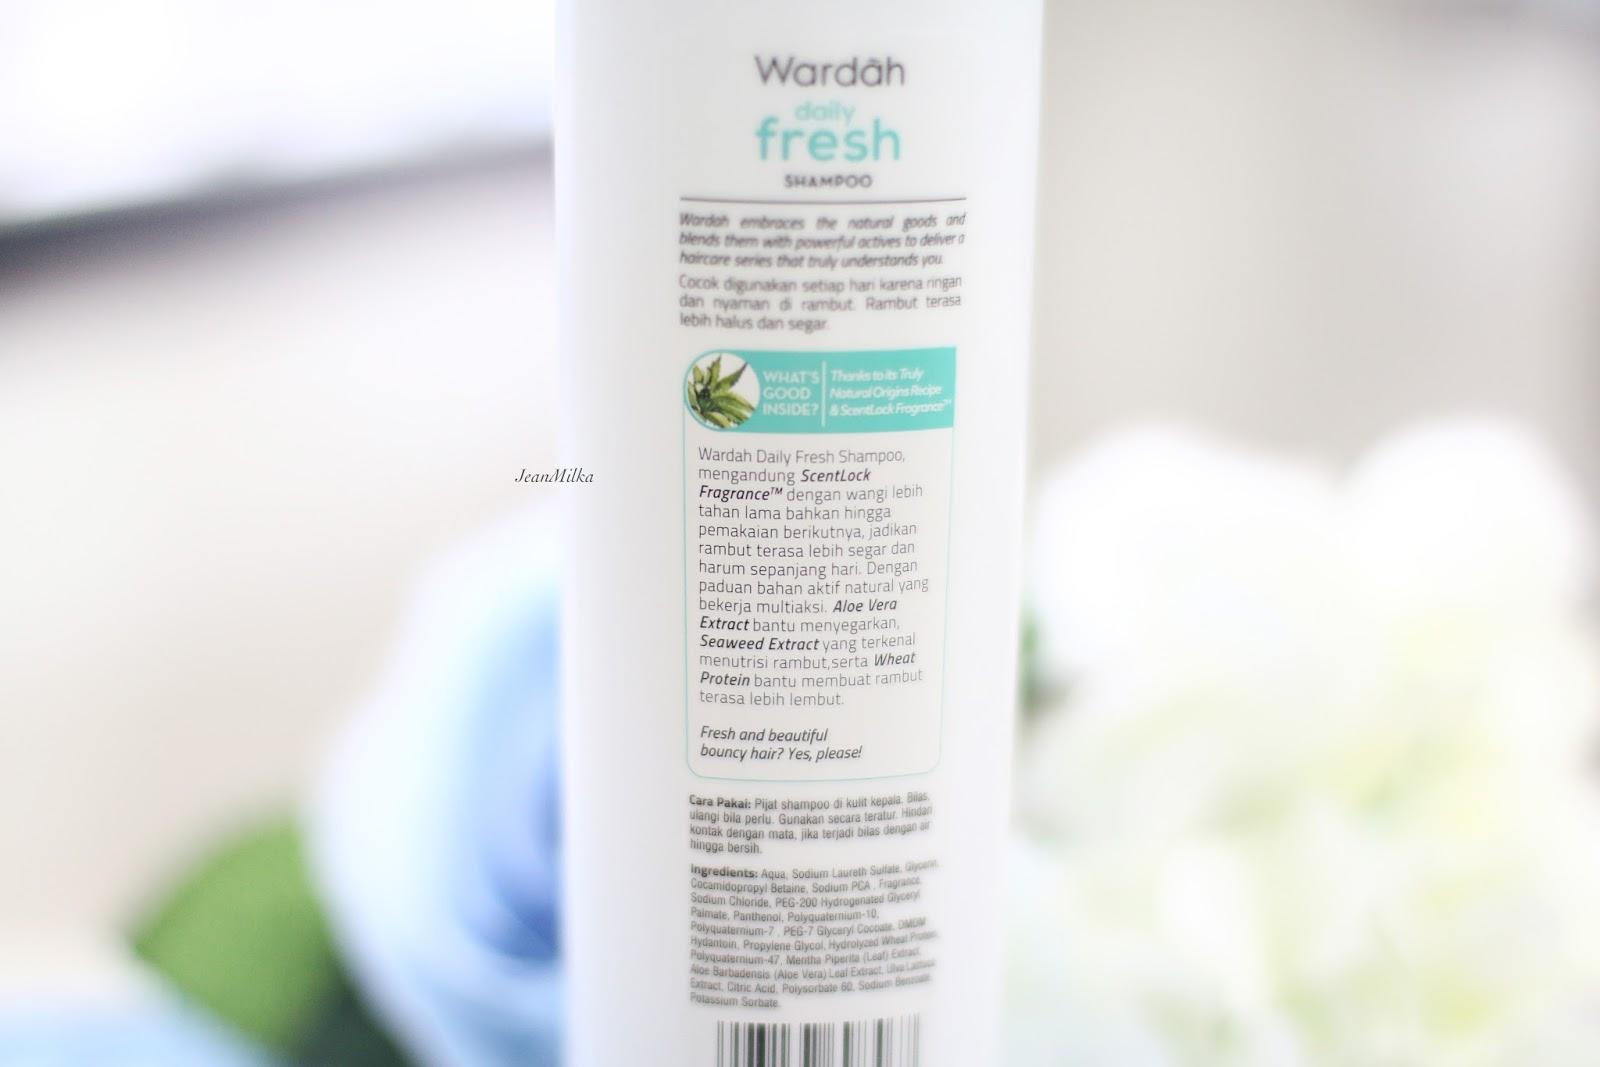 review, wardah, wardah shampoo, sampo wardah, sampo hijab, shampoo hijab, hijab, wardah beauty, wardah shampoo daily fresh